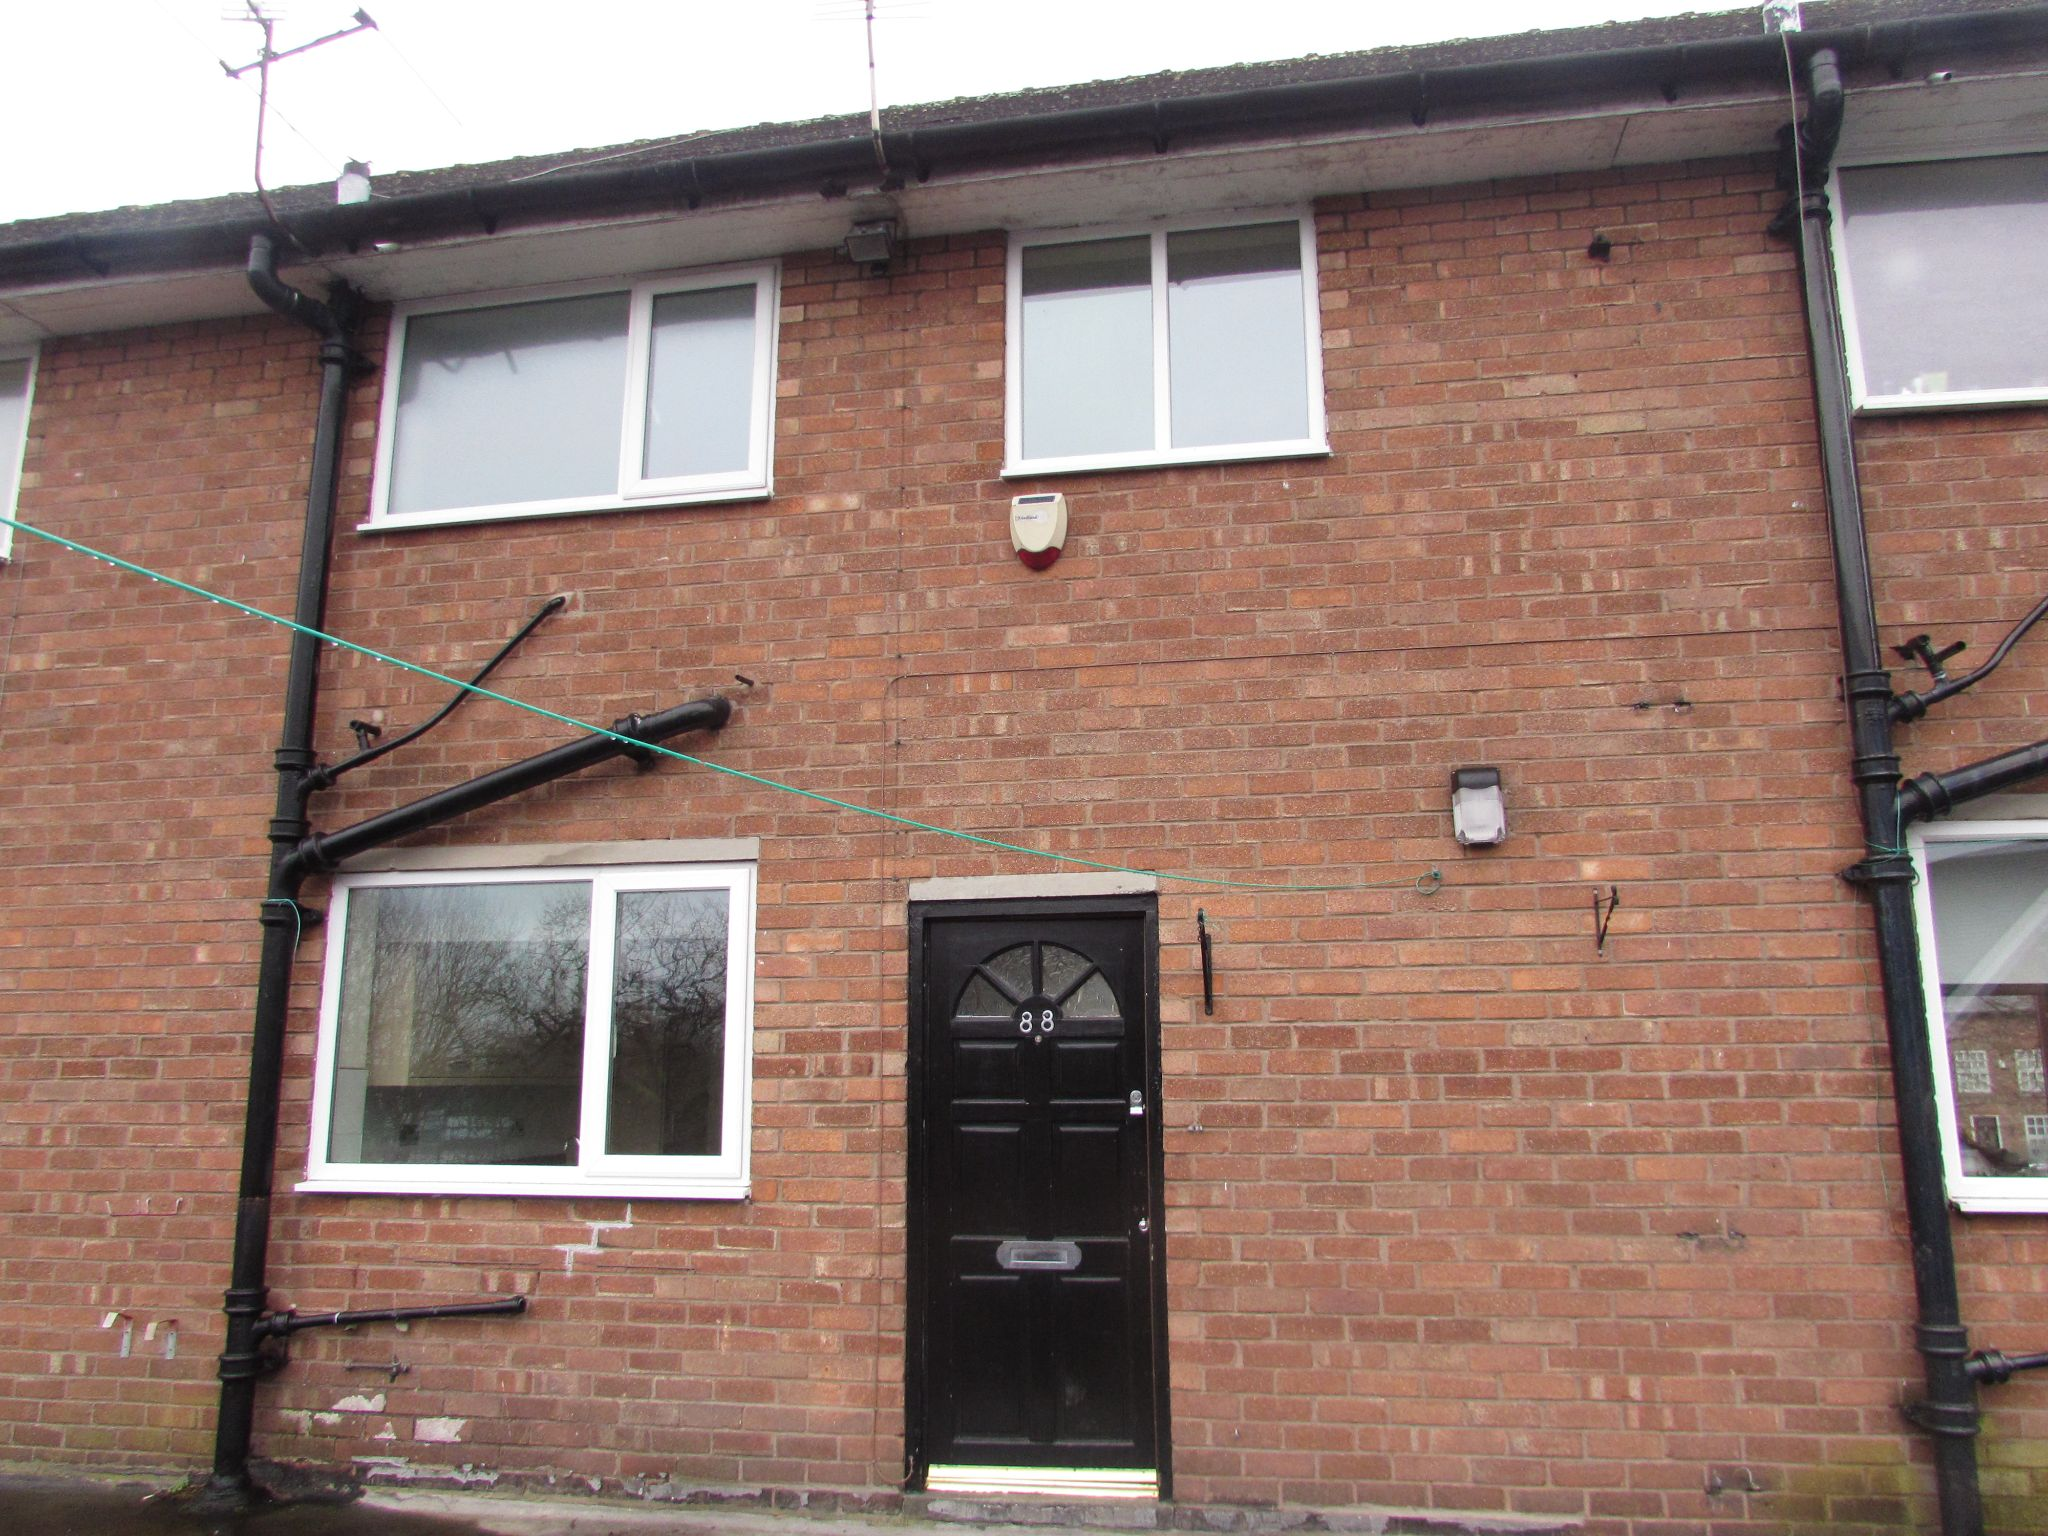 2 Bedroom Duplex Flat/apartment To Rent - Front